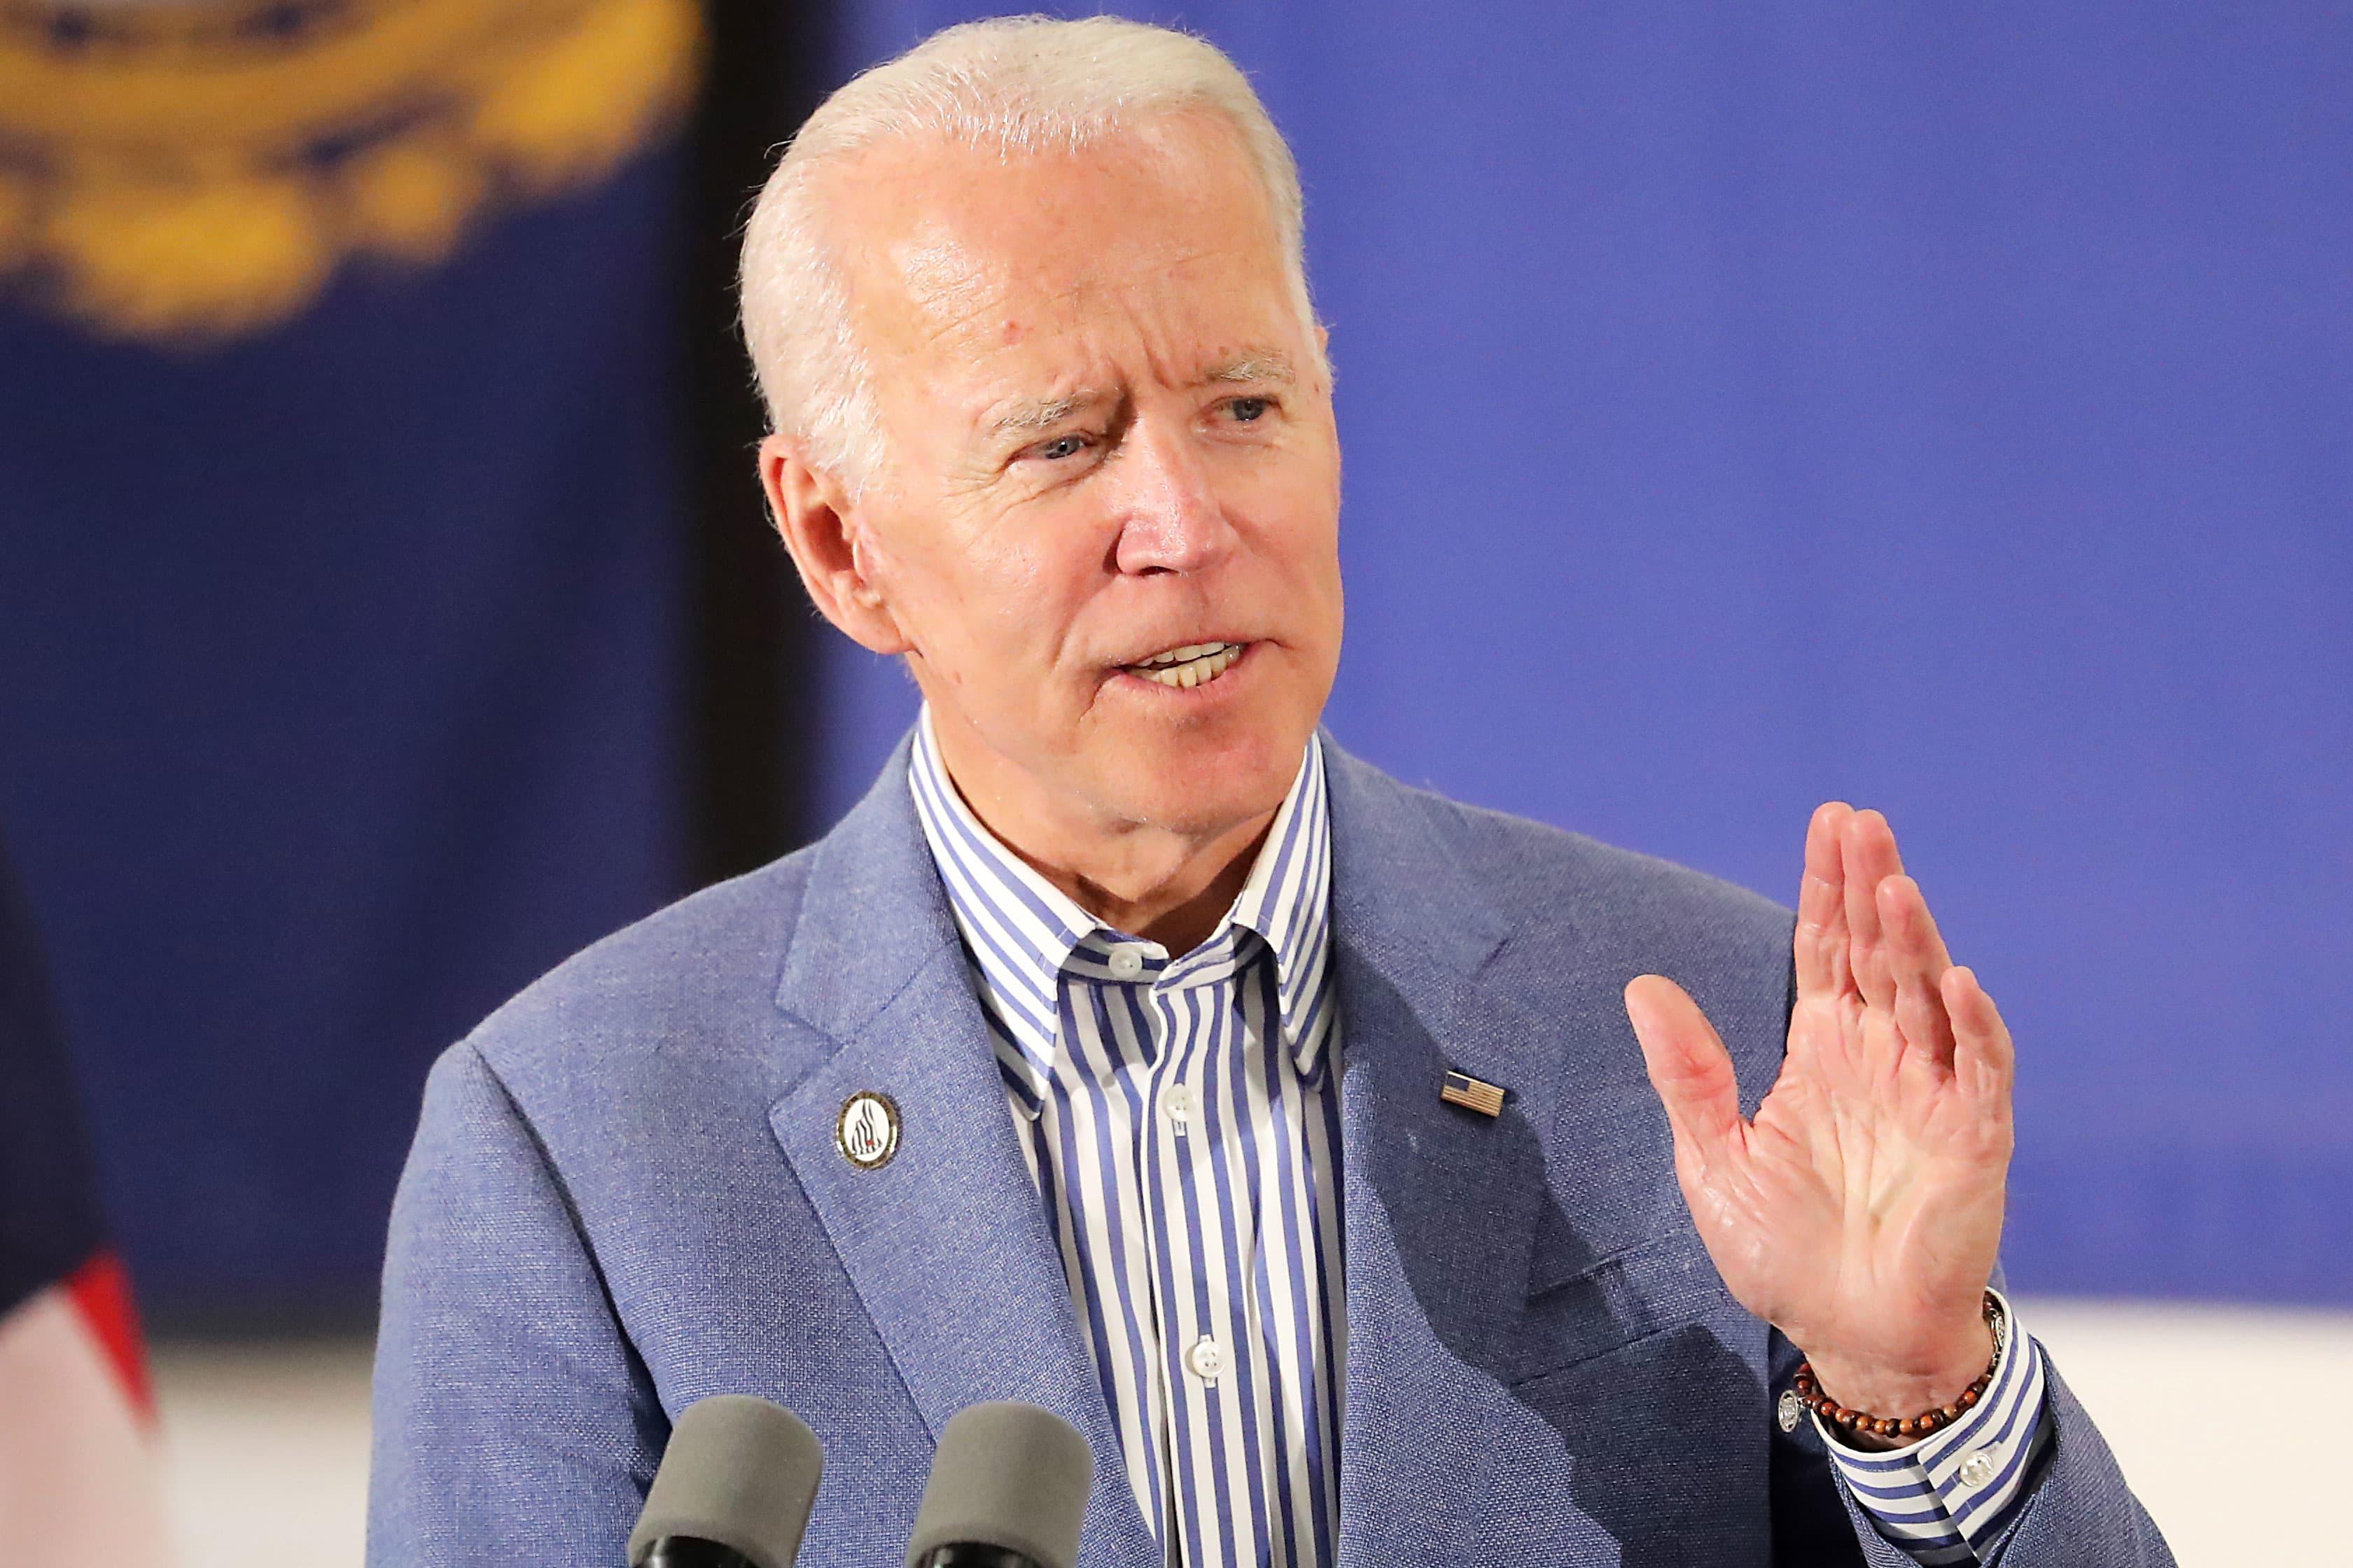 Democratic presidential candidates denounce Biden's comments about segregationist senators in personal terms